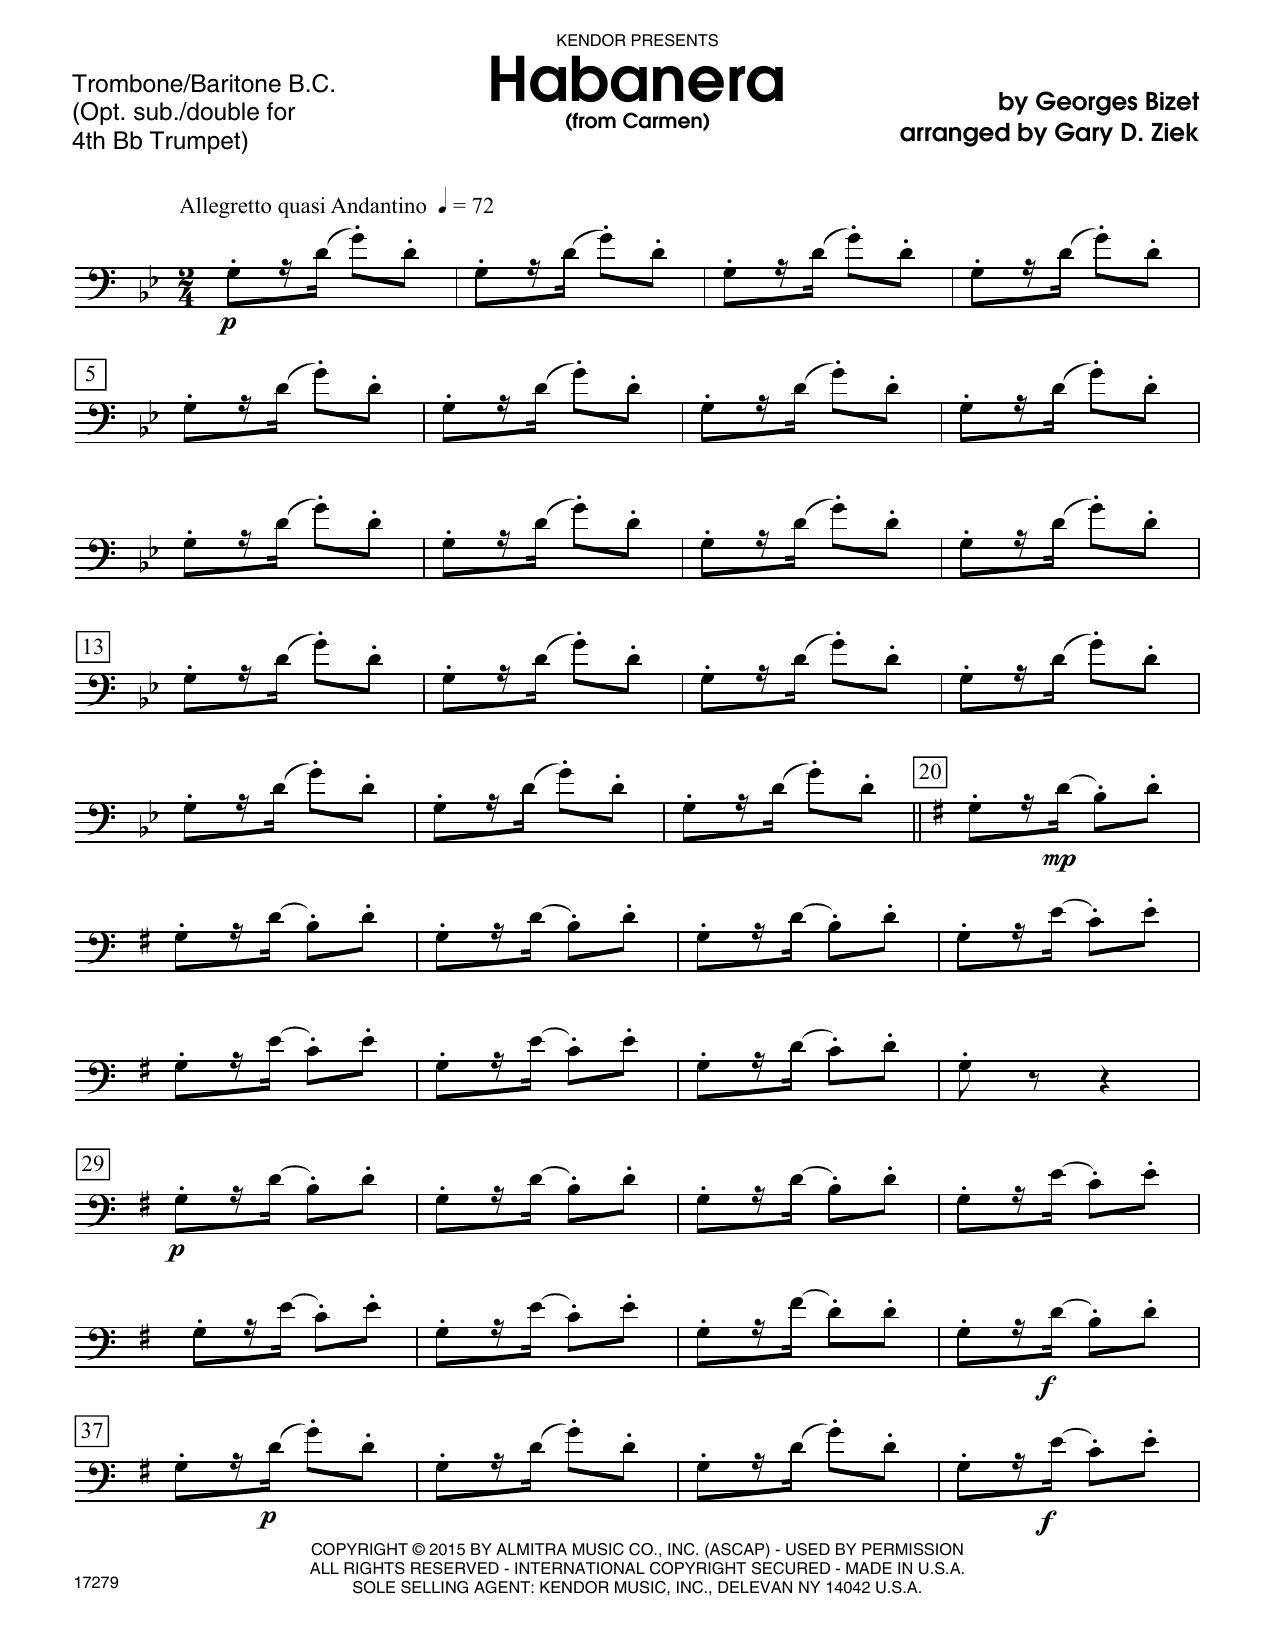 Habanera (from Carmen) - Trombone Sheet Music